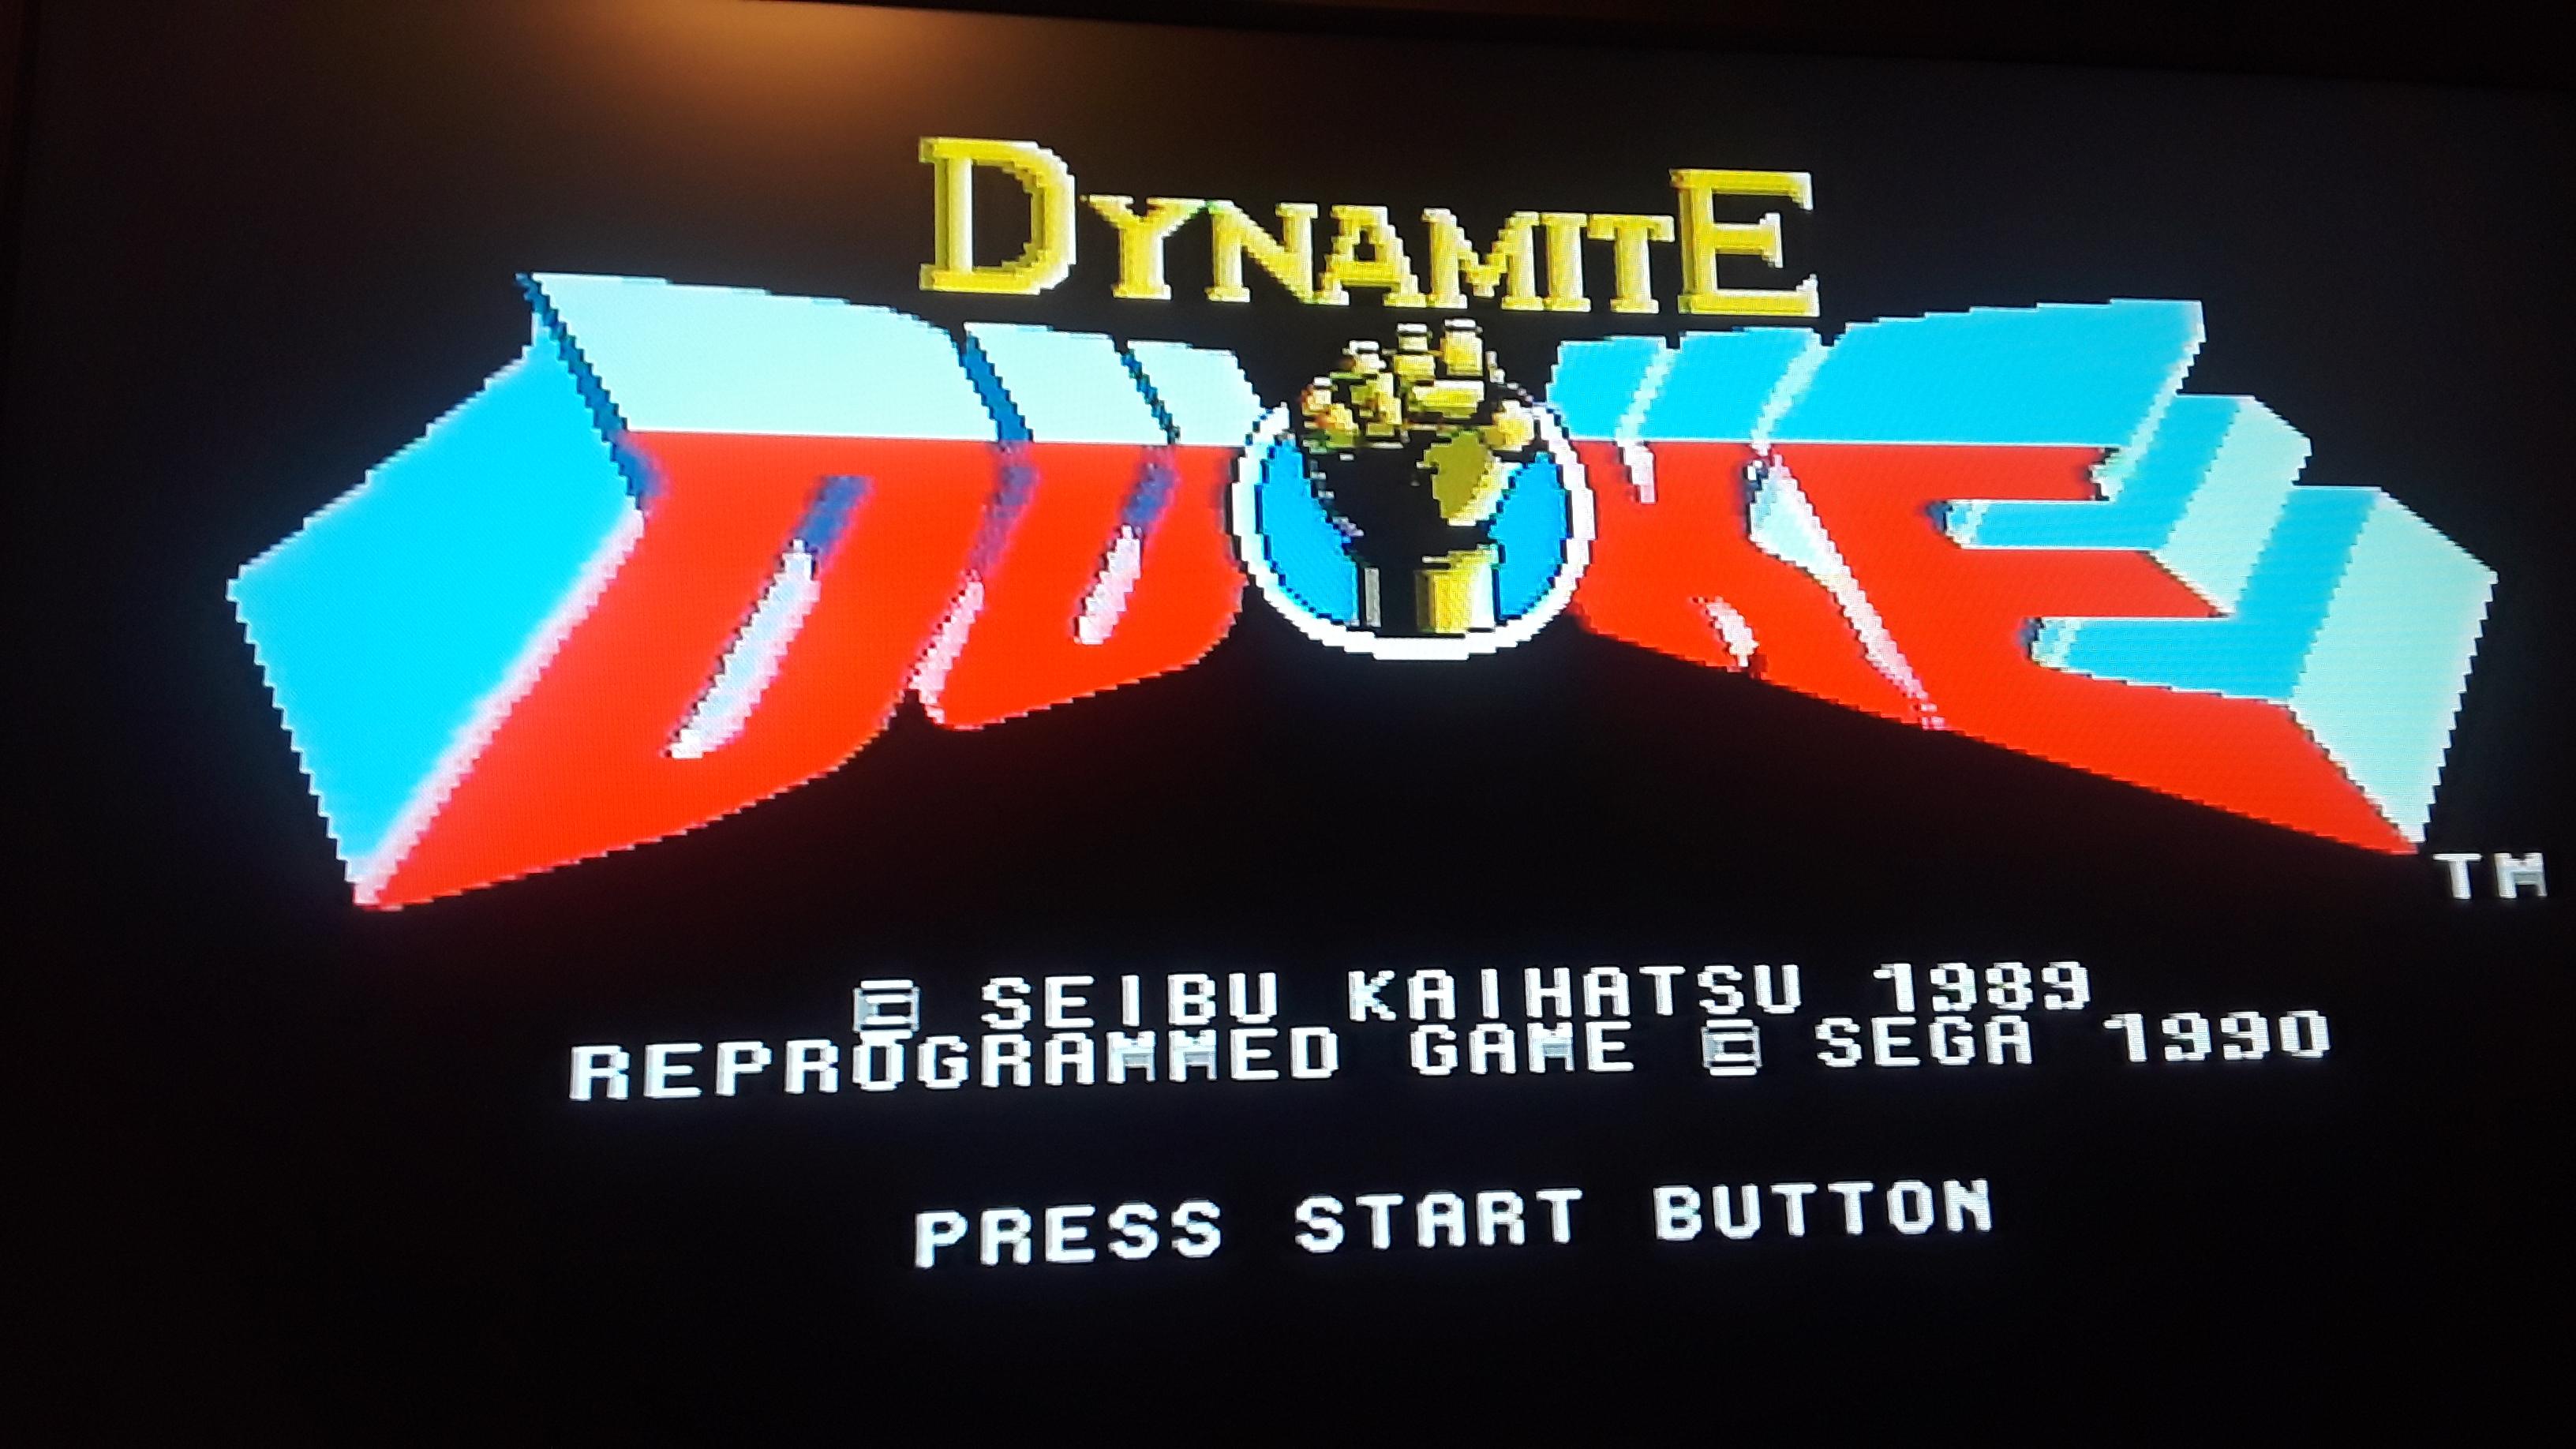 JML101582: Dynamite Duke [Easy] (Sega Genesis / MegaDrive Emulated) 21,300 points on 2019-12-08 16:56:04